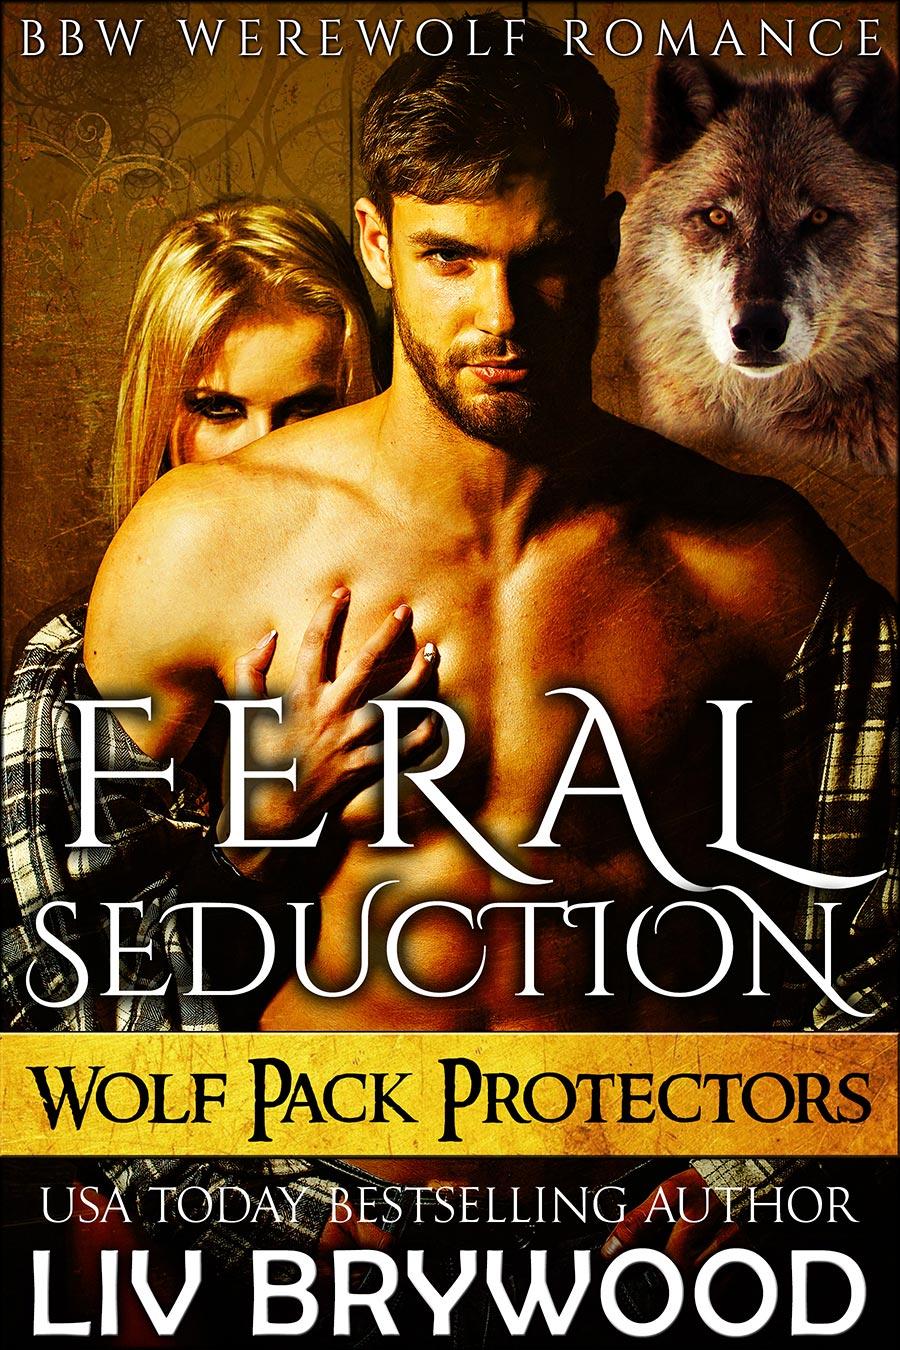 Feral-Seduction---Wolf-Pack-Protectors---book-1.jpg